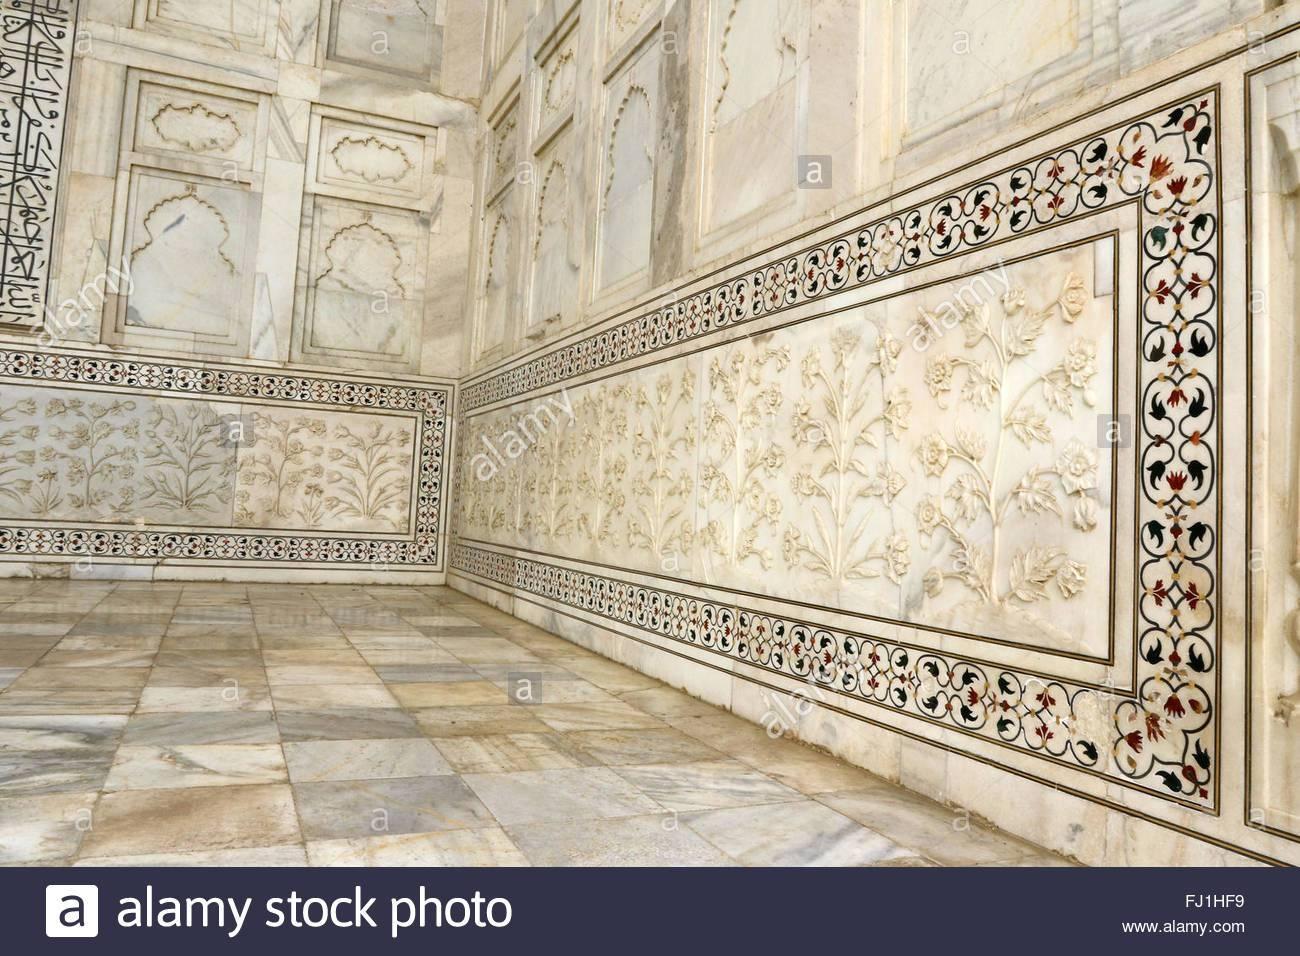 Taj Mahal Marble Art Flowers Plants Carving On Taj Mahal Marble Throughout Most Recent Taj Mahal Wall Art (View 8 of 25)